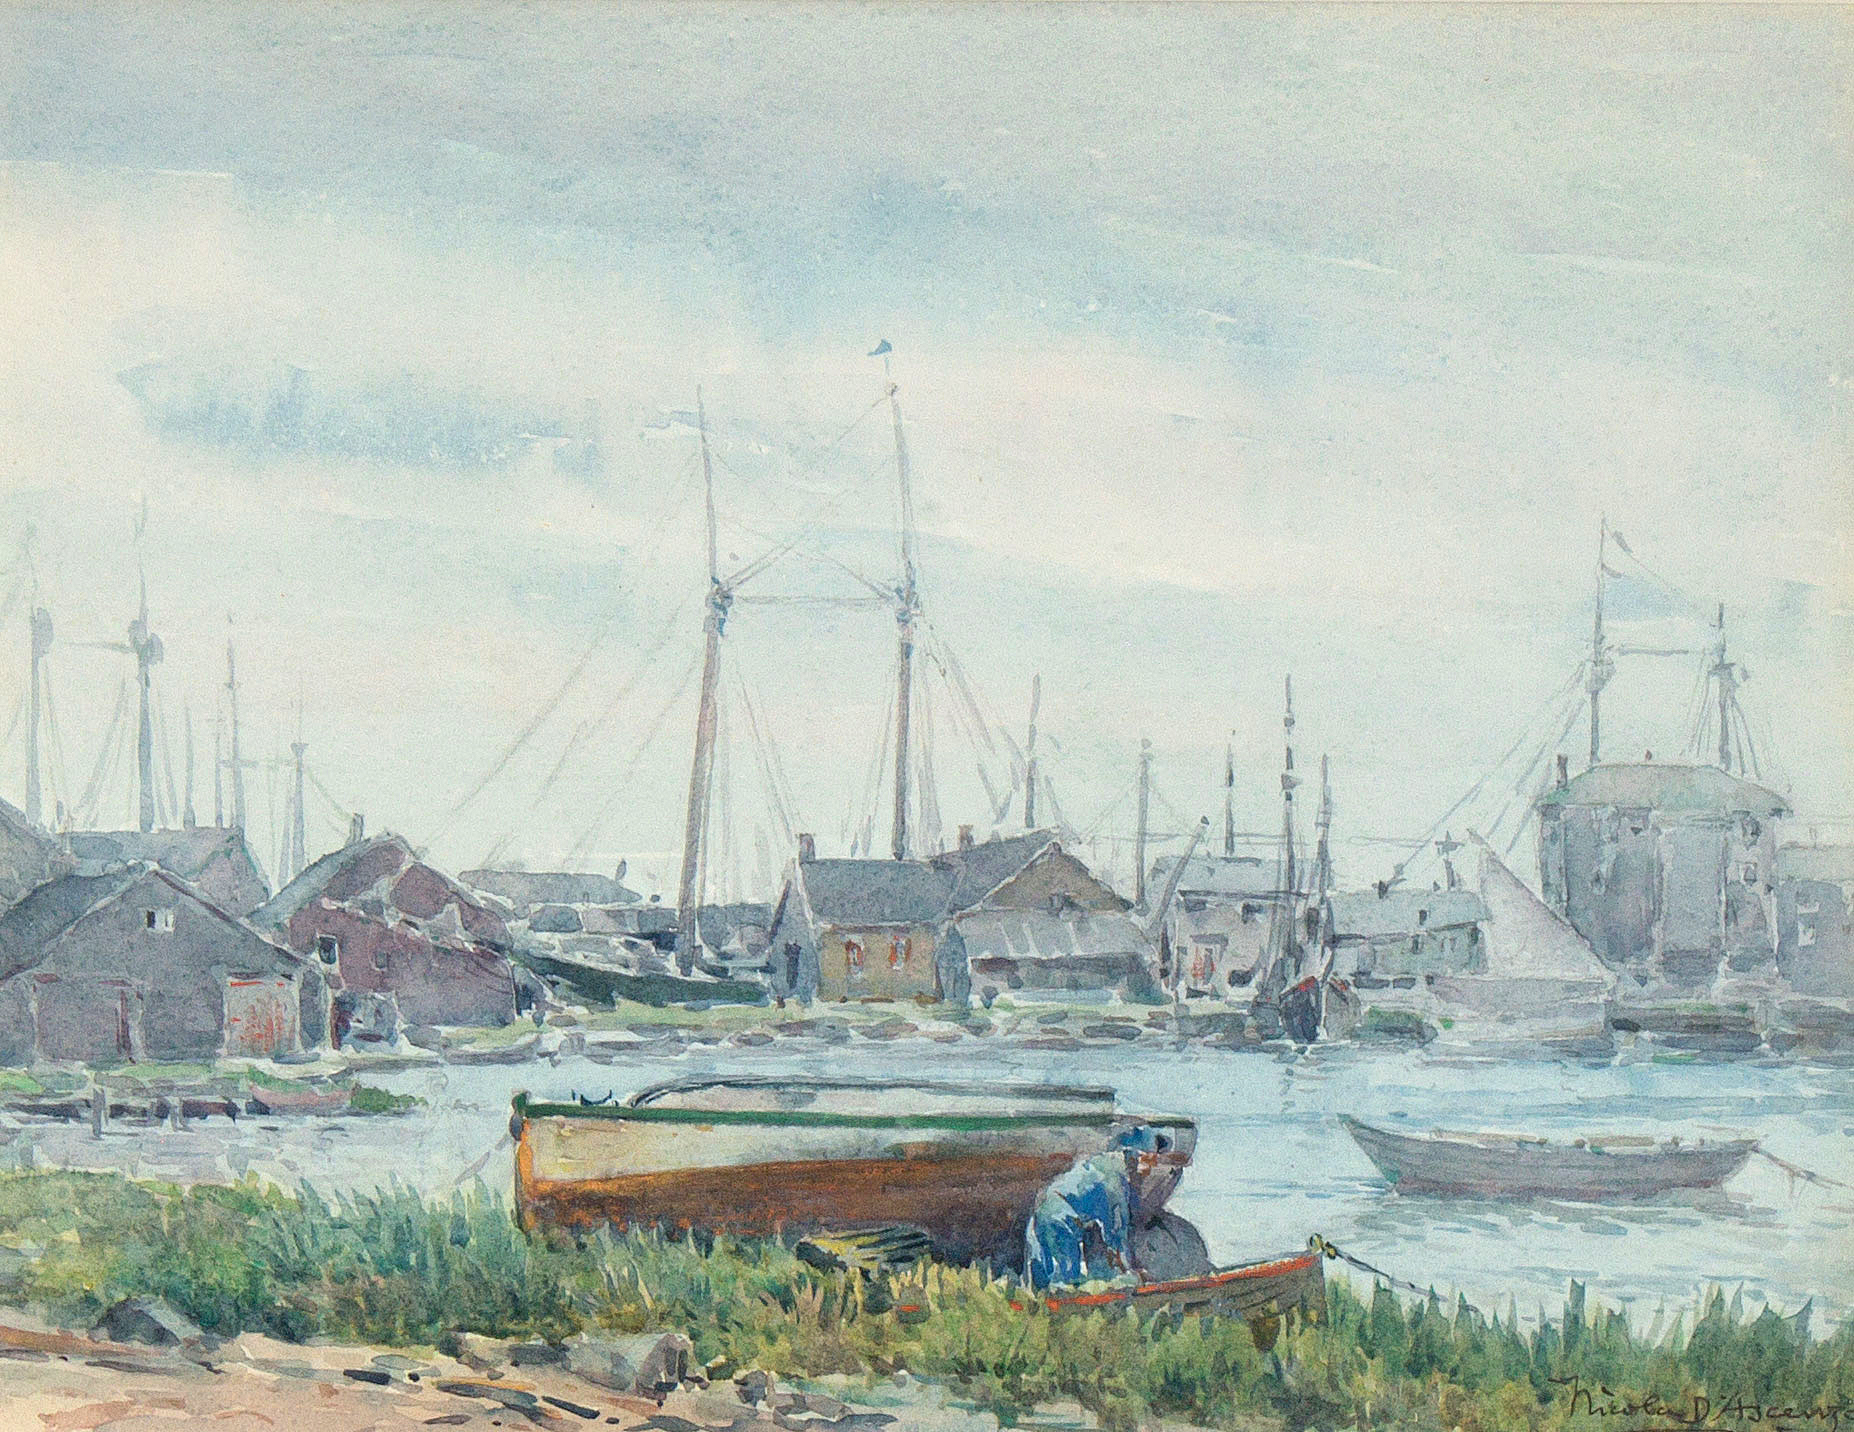 Nantucket (Nicola D'Ascenzo)